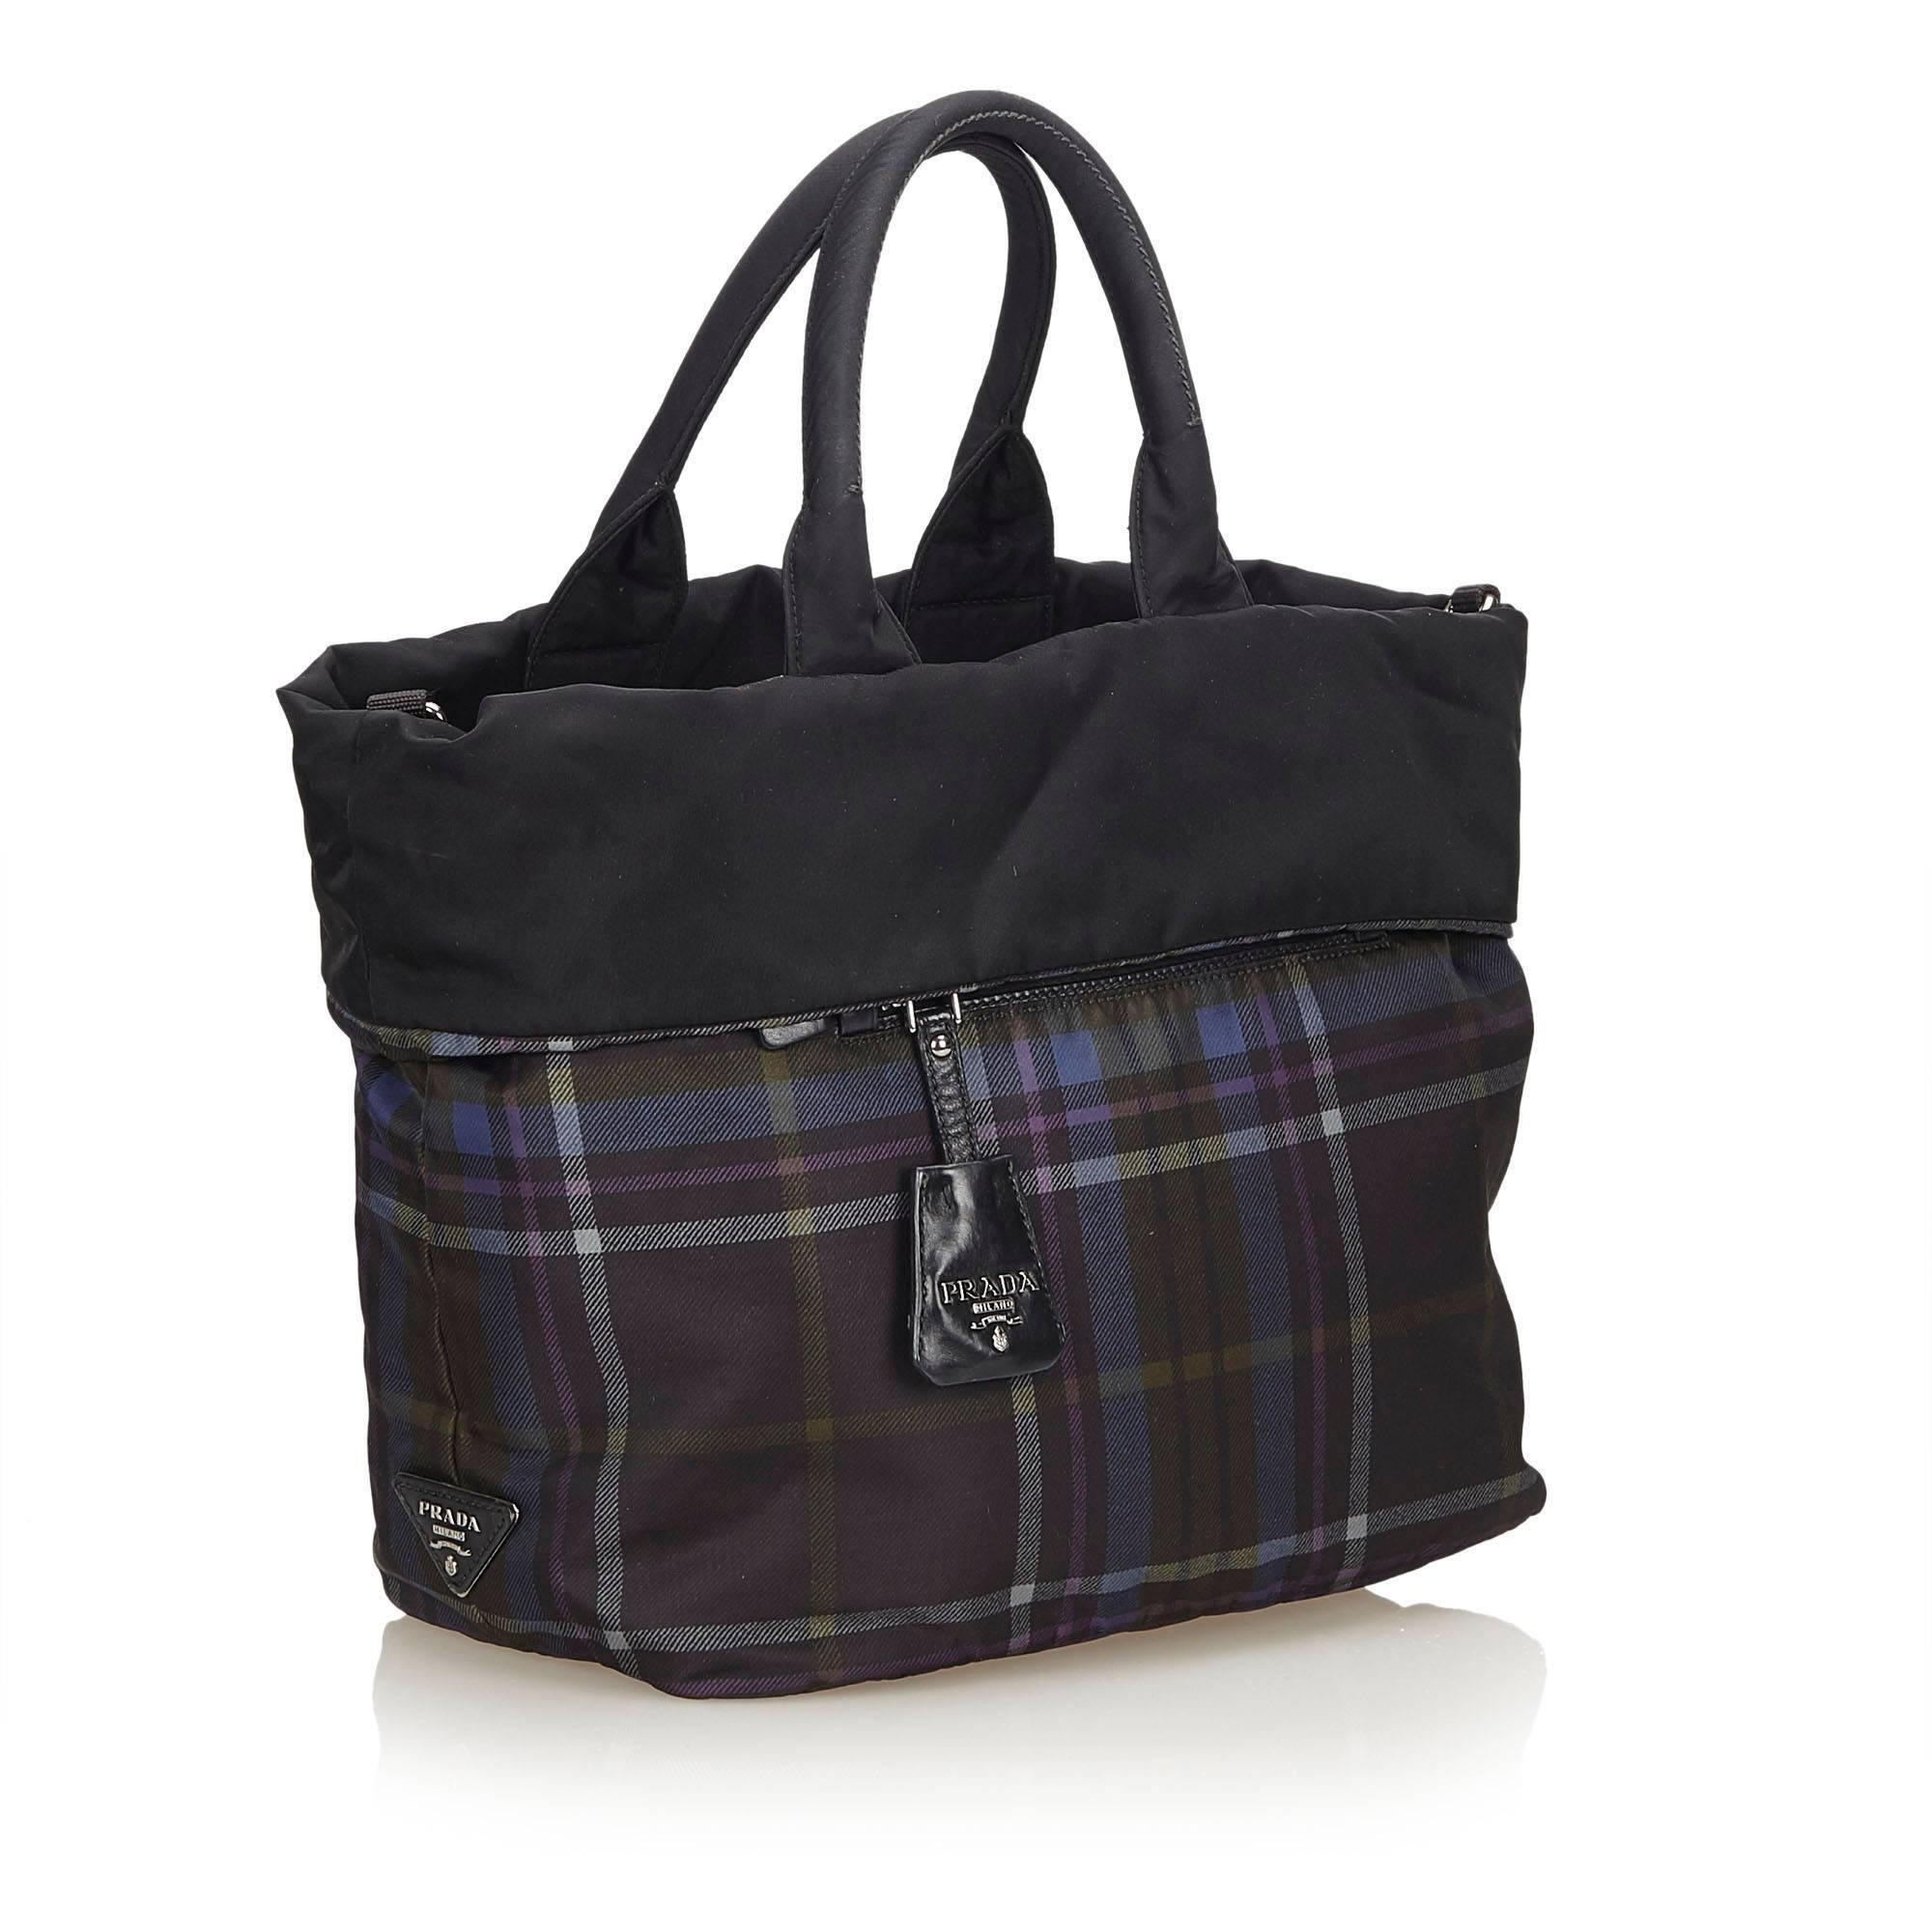 ec65a4775e Prada Black Reversible Plaid Nylon Tote Bag at 1stdibs